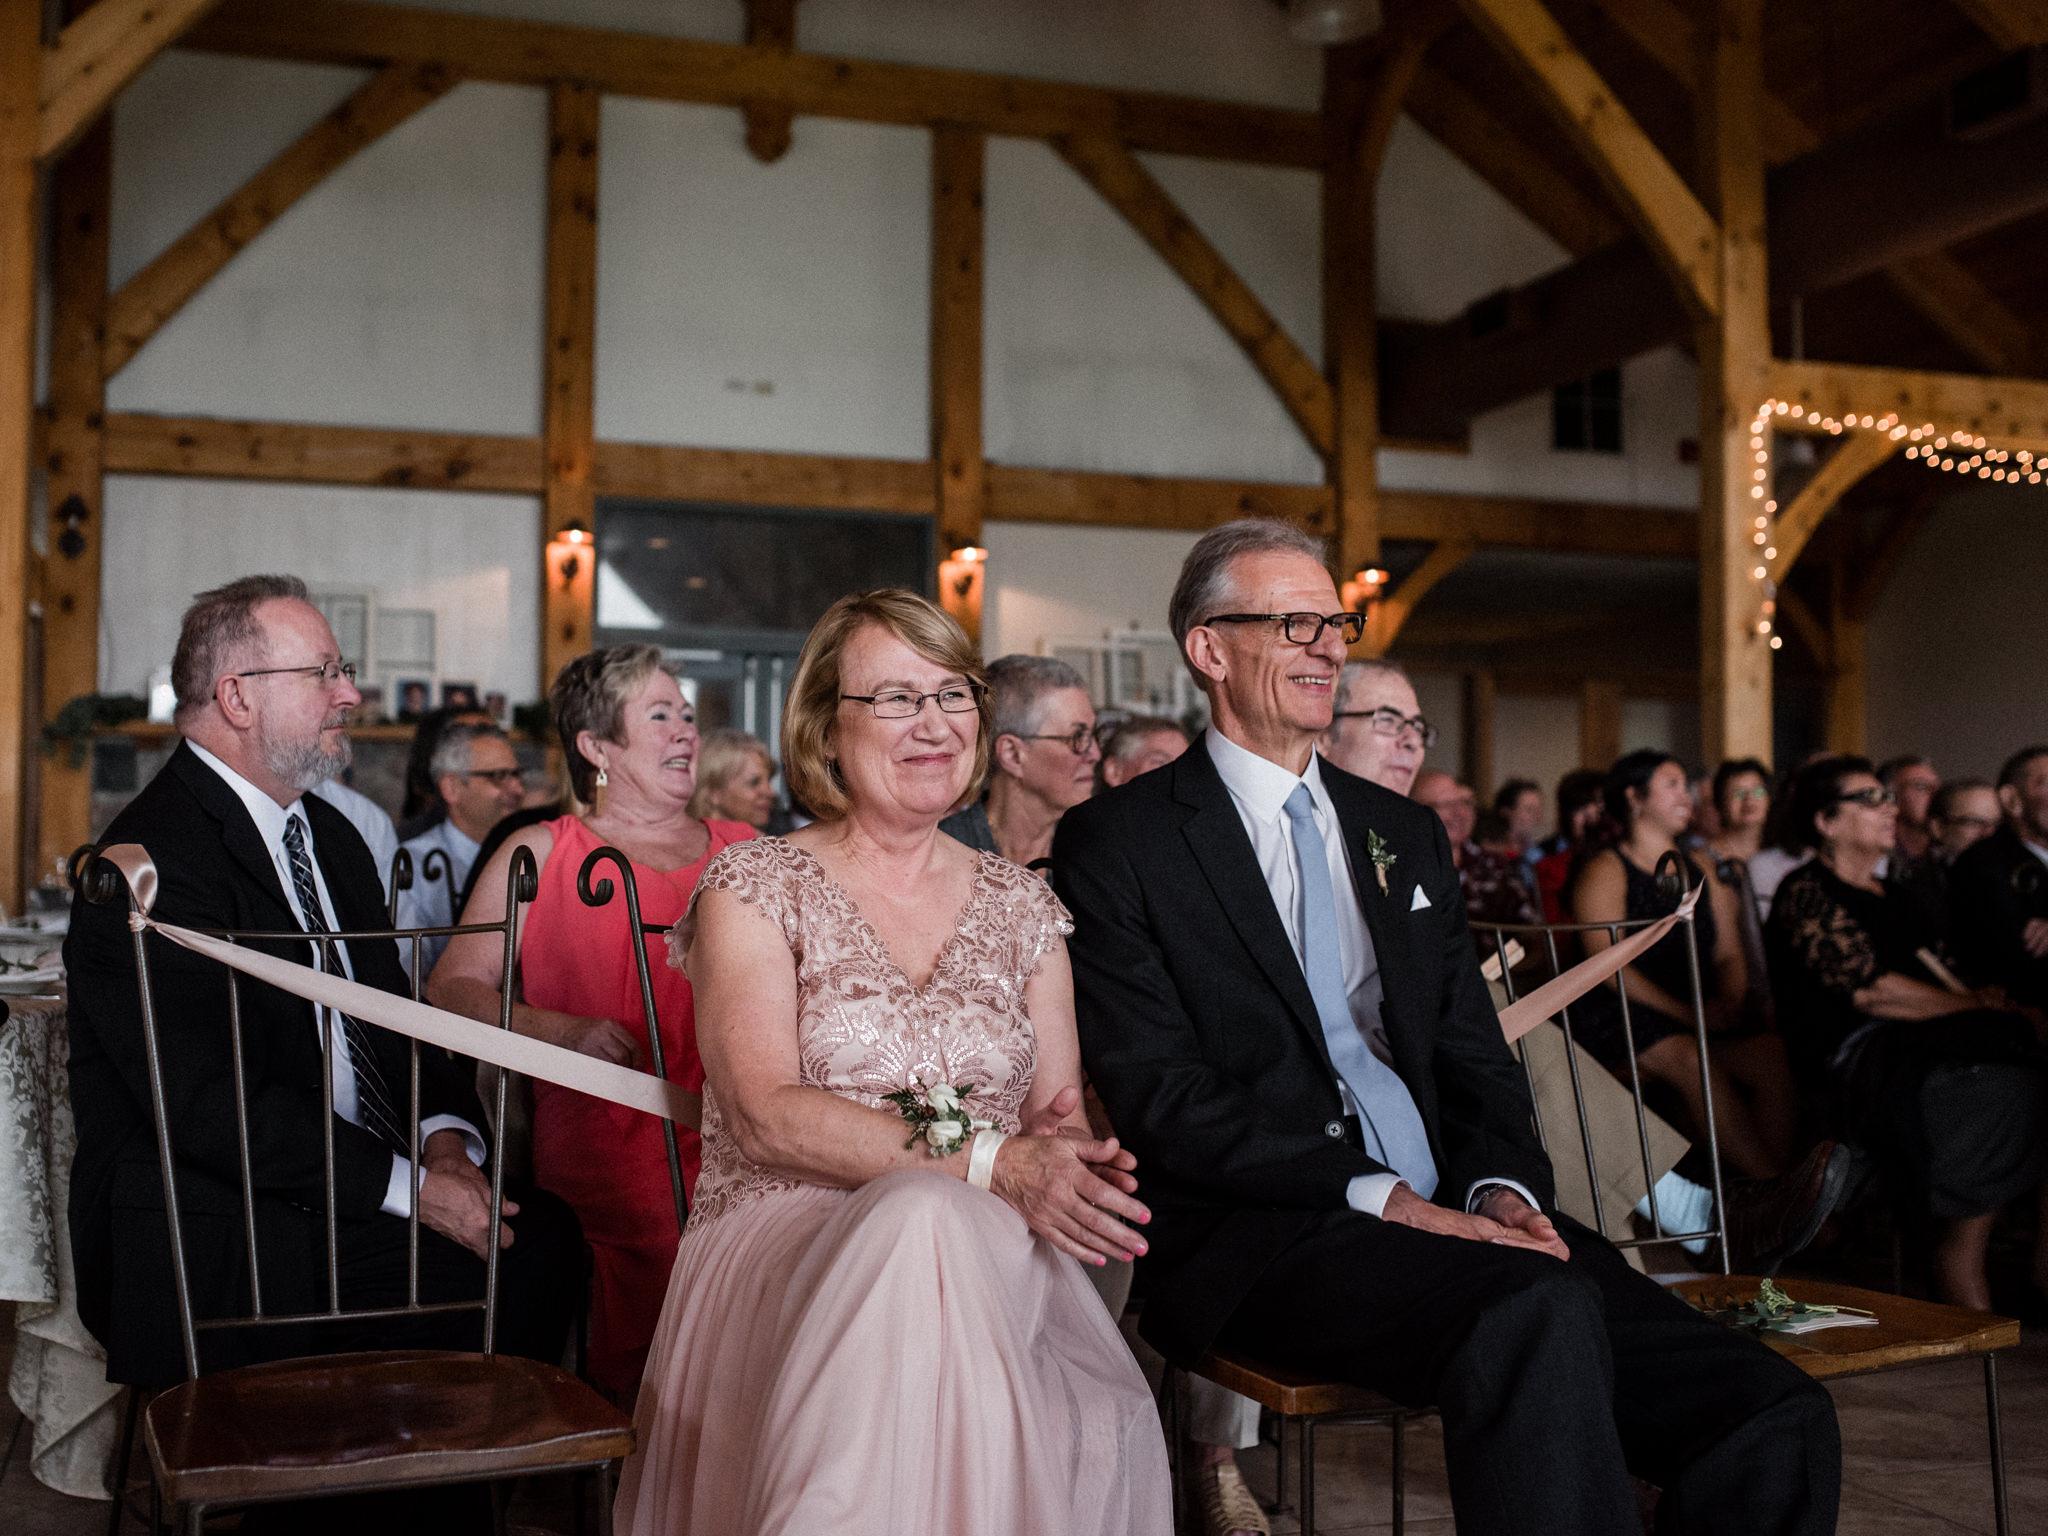 skyloft-wedding-toronto-wedding-photographer-35.jpg